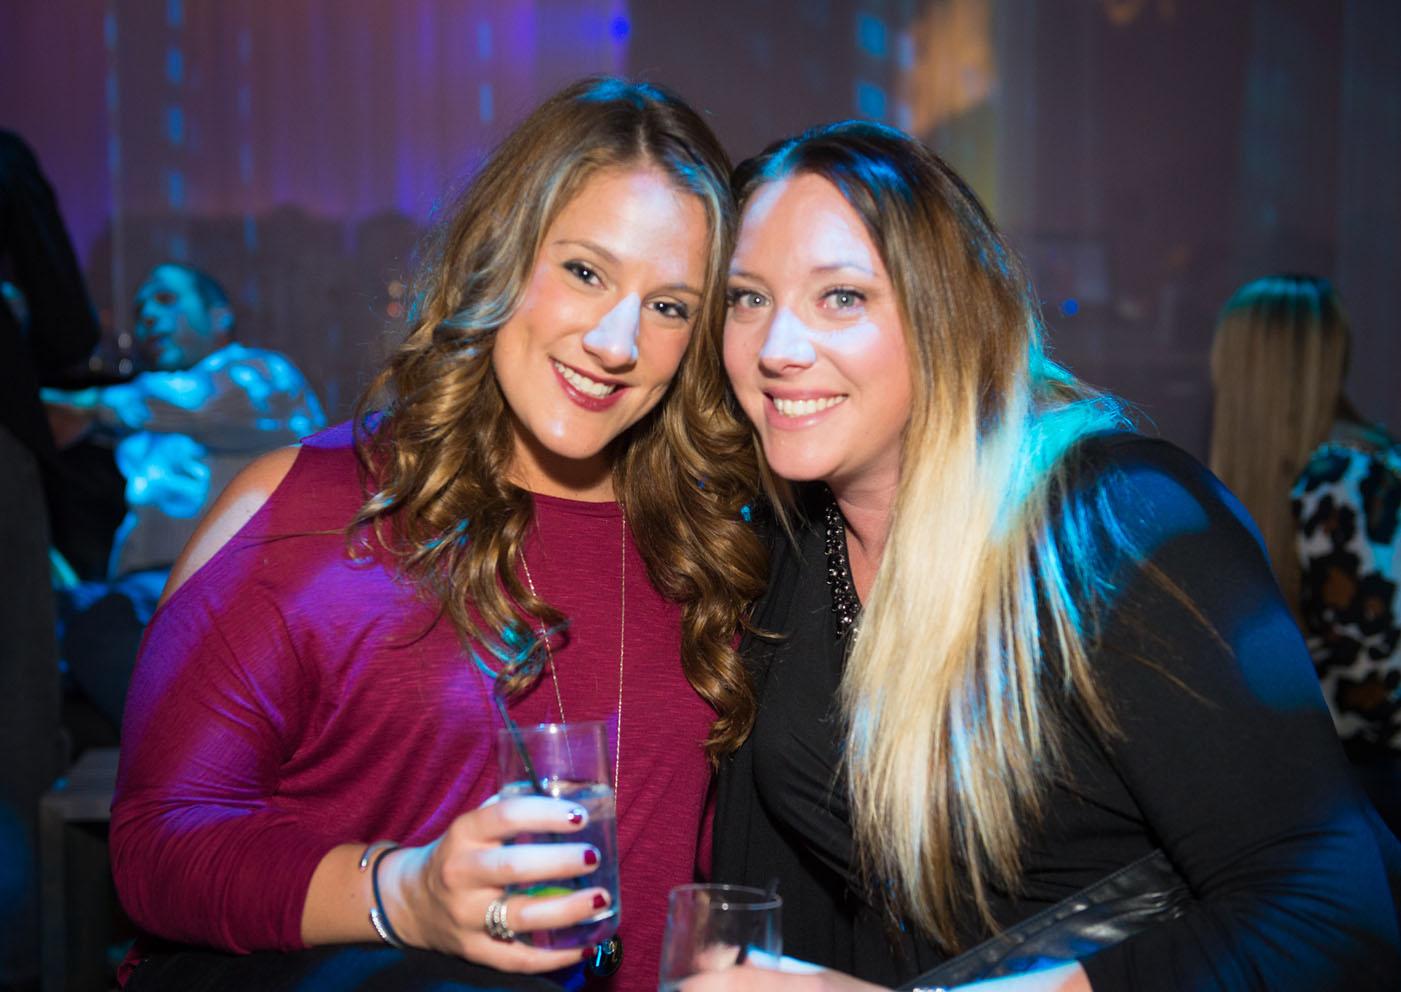 2015-12-09 ReMax Corpoarte Event - The Borgata - Atlantic City NJ - Photo Sesh - 2015-5176.jpg